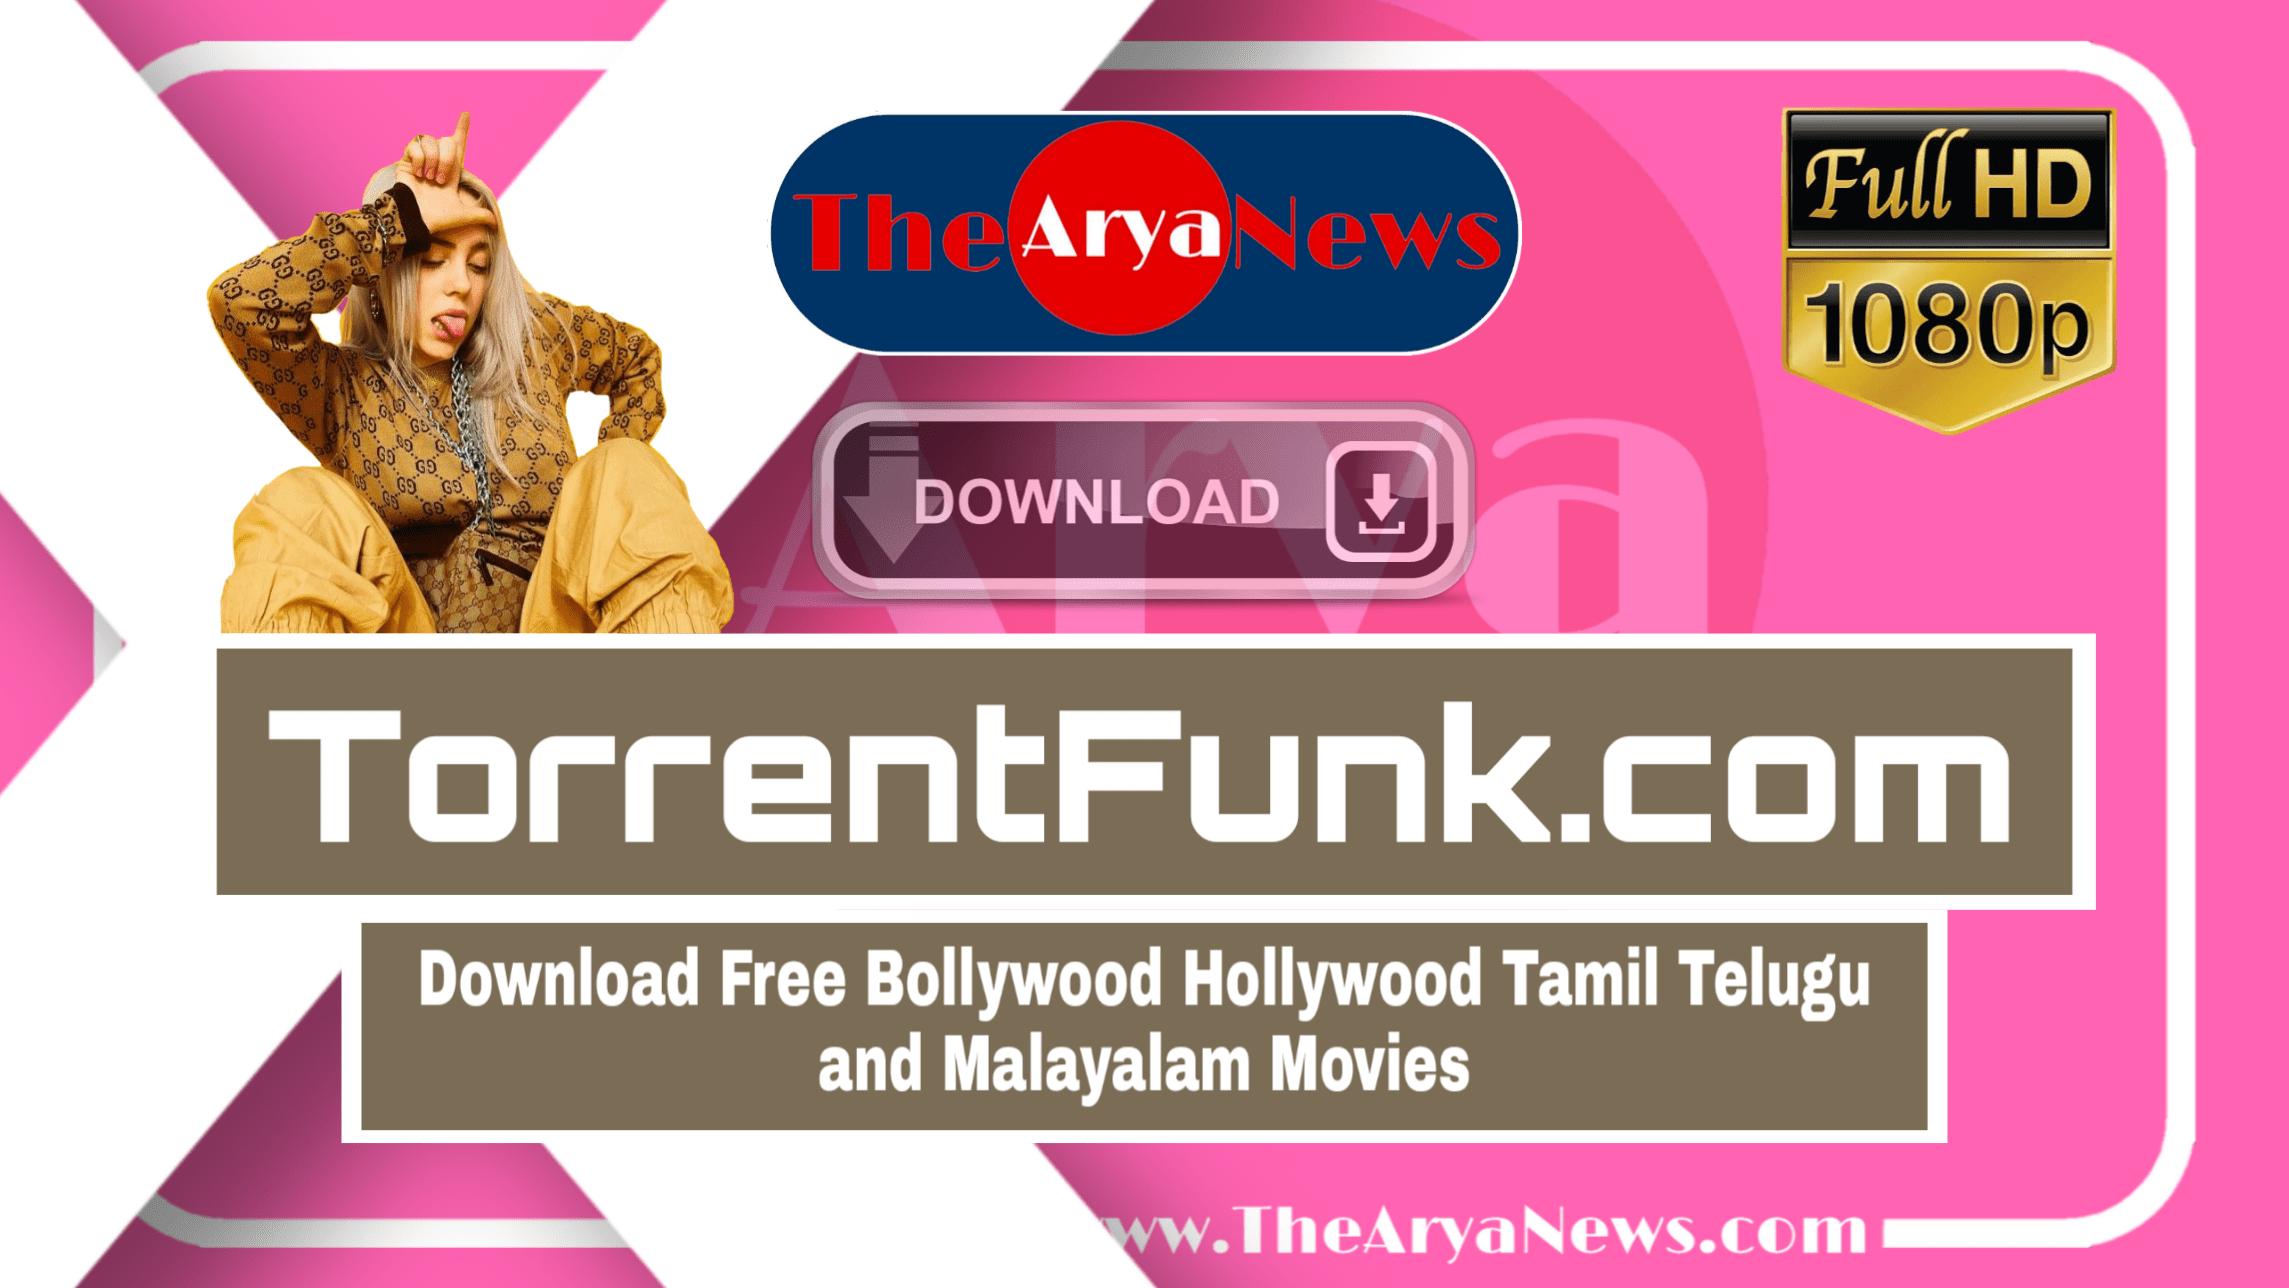 TorrentFunk.com: » Download Full HD Movies for Free 720p